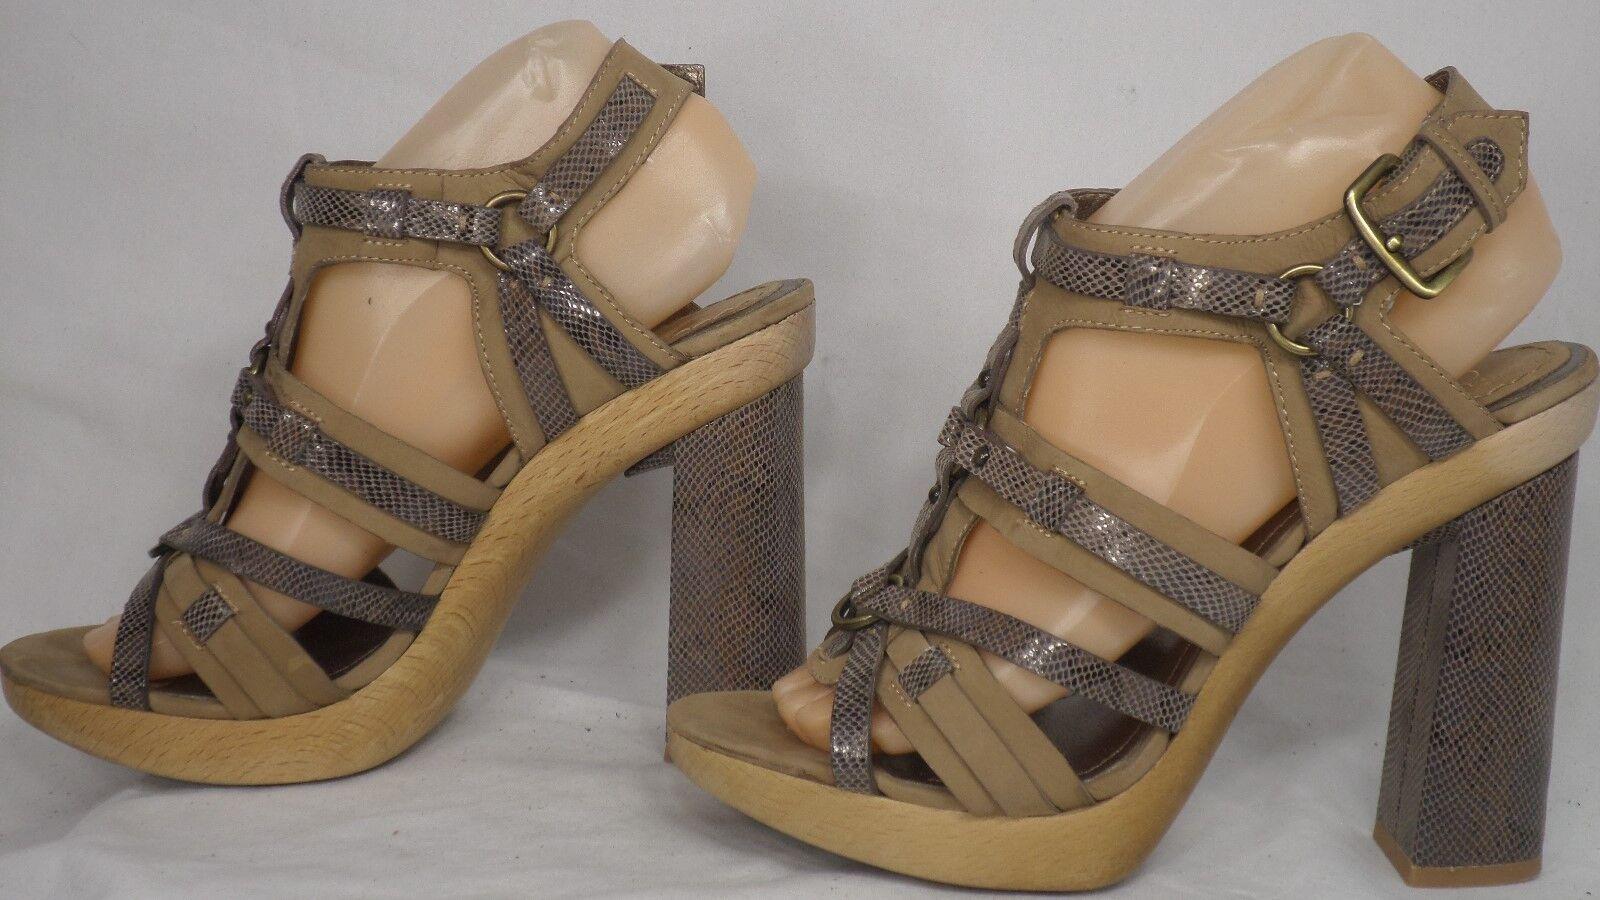 Joan & David 'Sweetlyn' Brown with Snakeprint Leather Platform Sandal Size 9 M